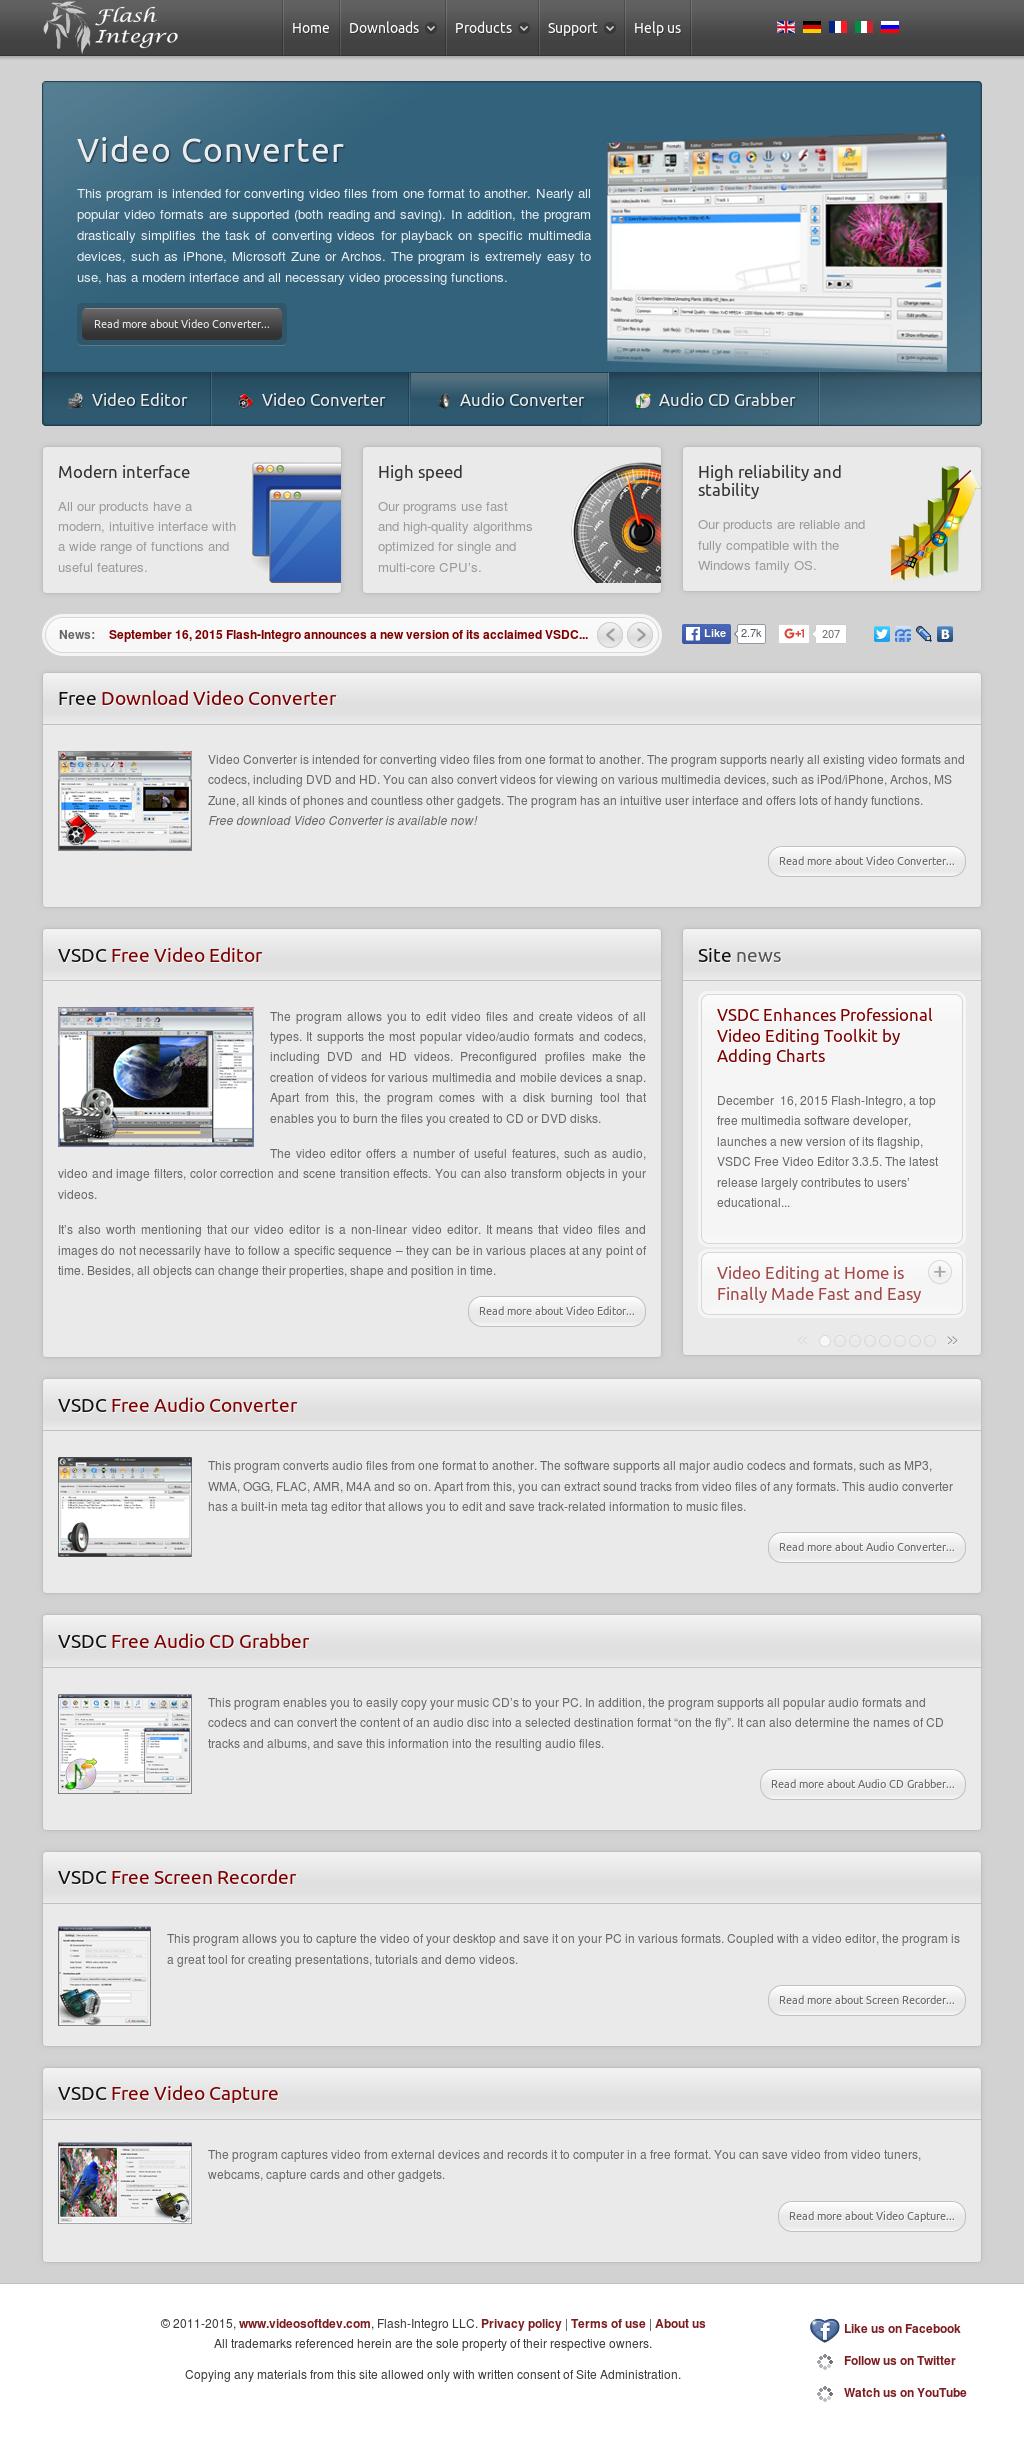 Owler Reports - Press Release: VideoSoftDev : Flash-Integro